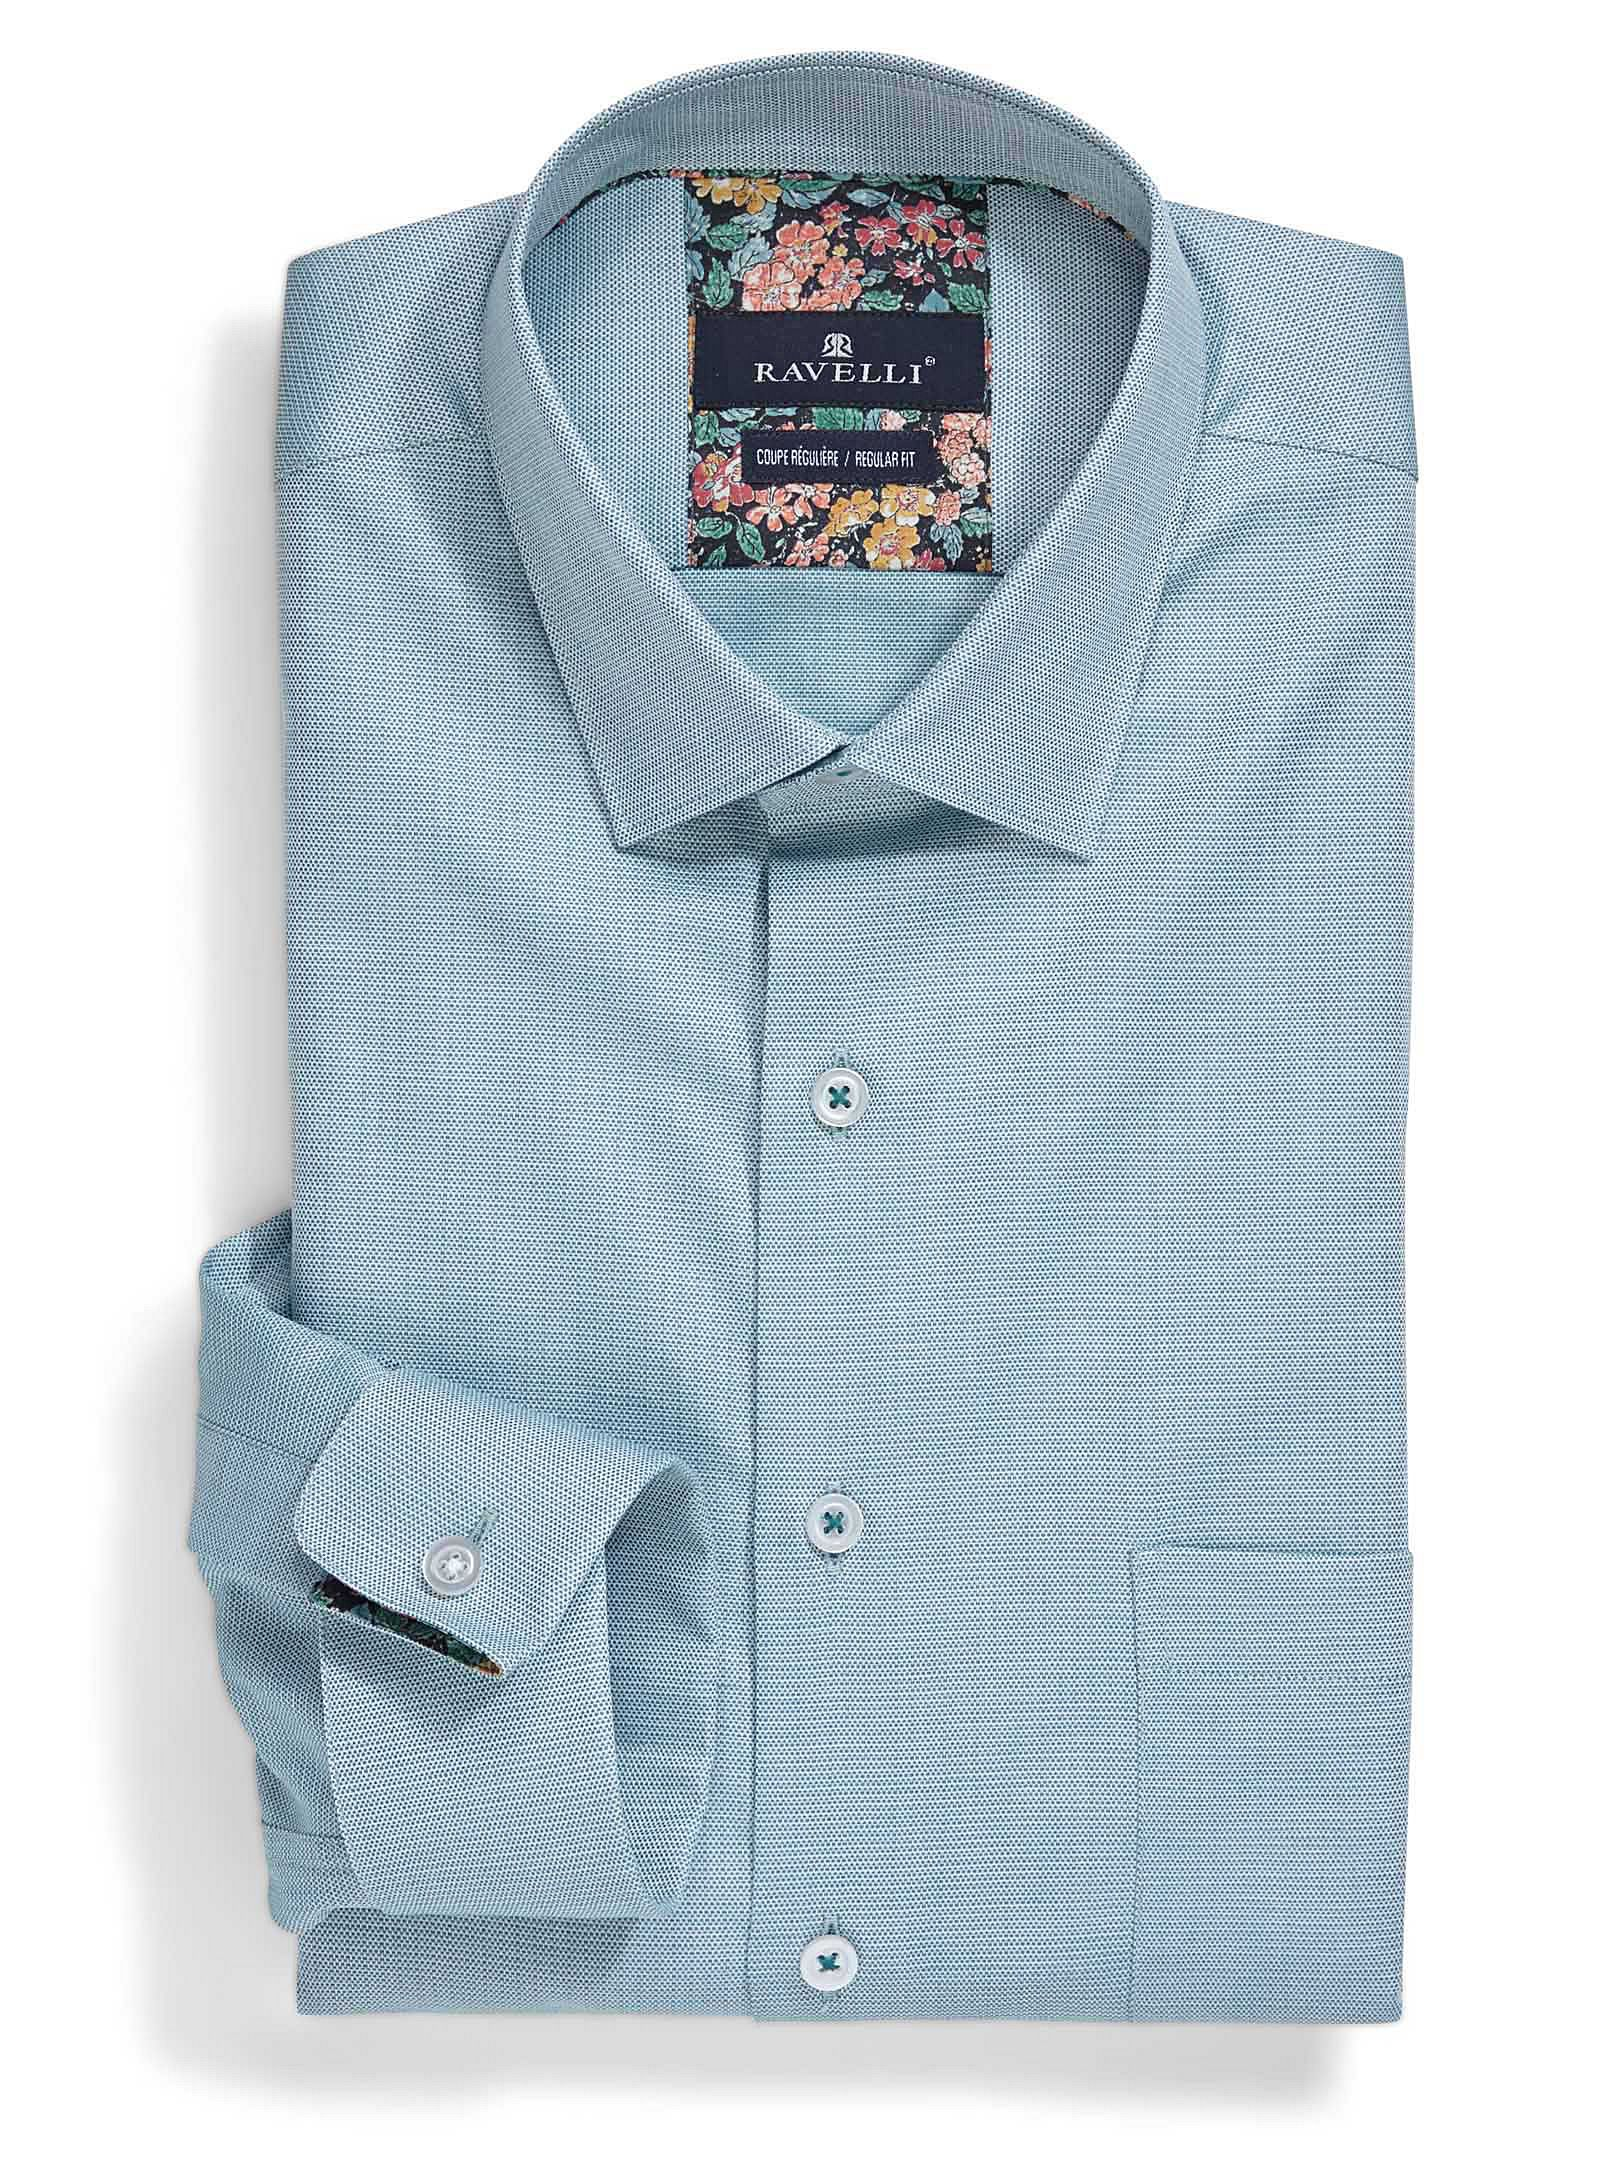 Sea Blue Shirt Regular Fit Mens Shirt Dress Mens Shirts Shirts